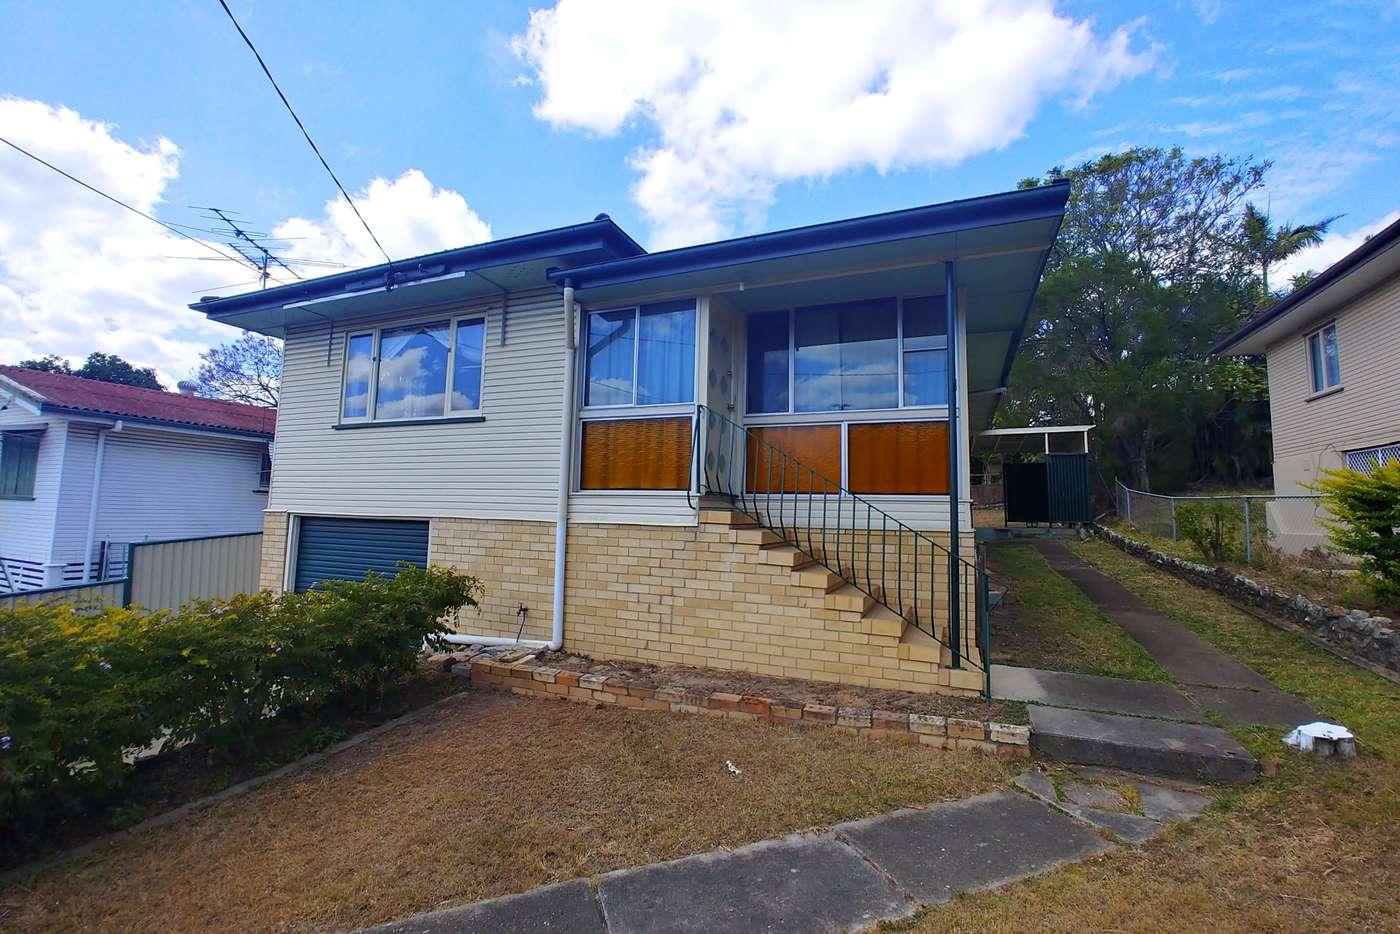 Main view of Homely house listing, 139 Mt Gravatt-Capalaba Road, Upper Mount Gravatt QLD 4122